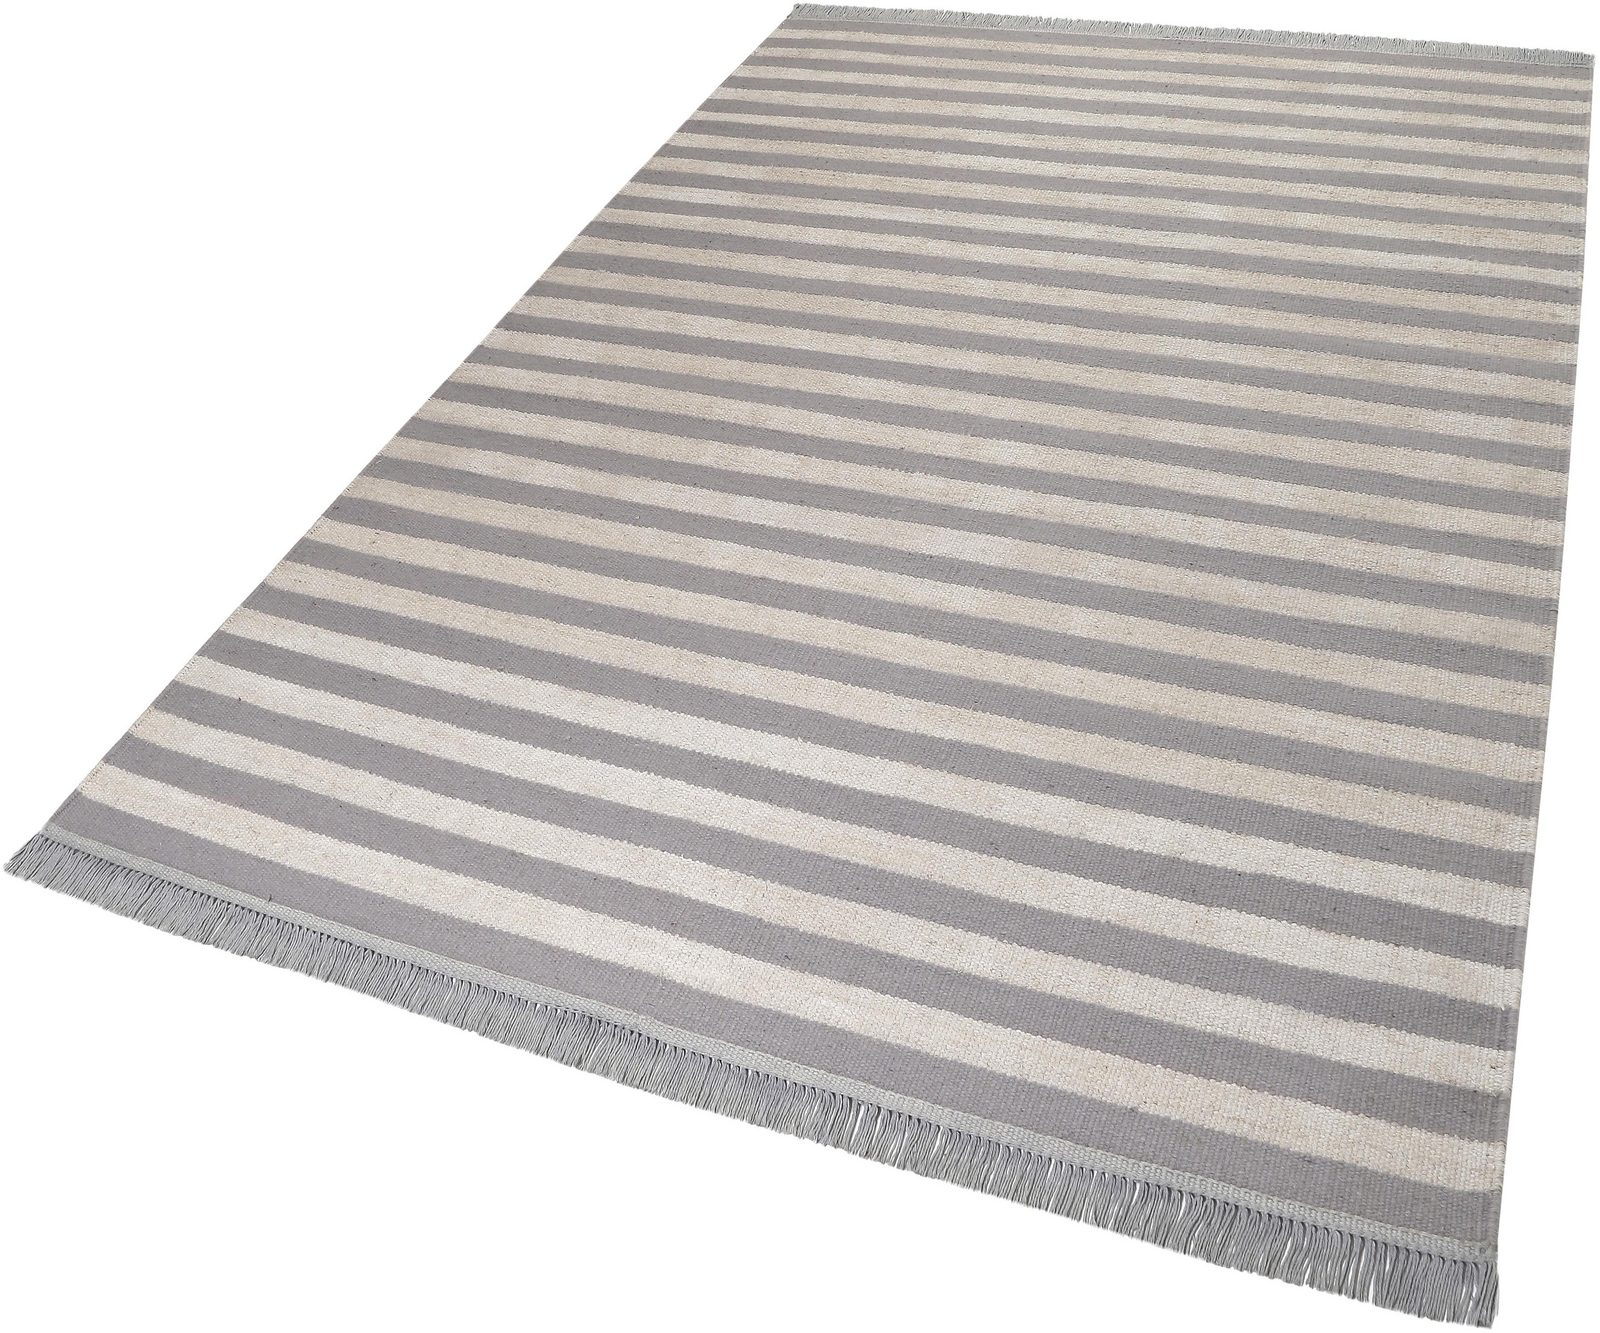 Teppich »Noble Stripes«, carpets&co, rechteckig, Höhe 5 mm - broschei